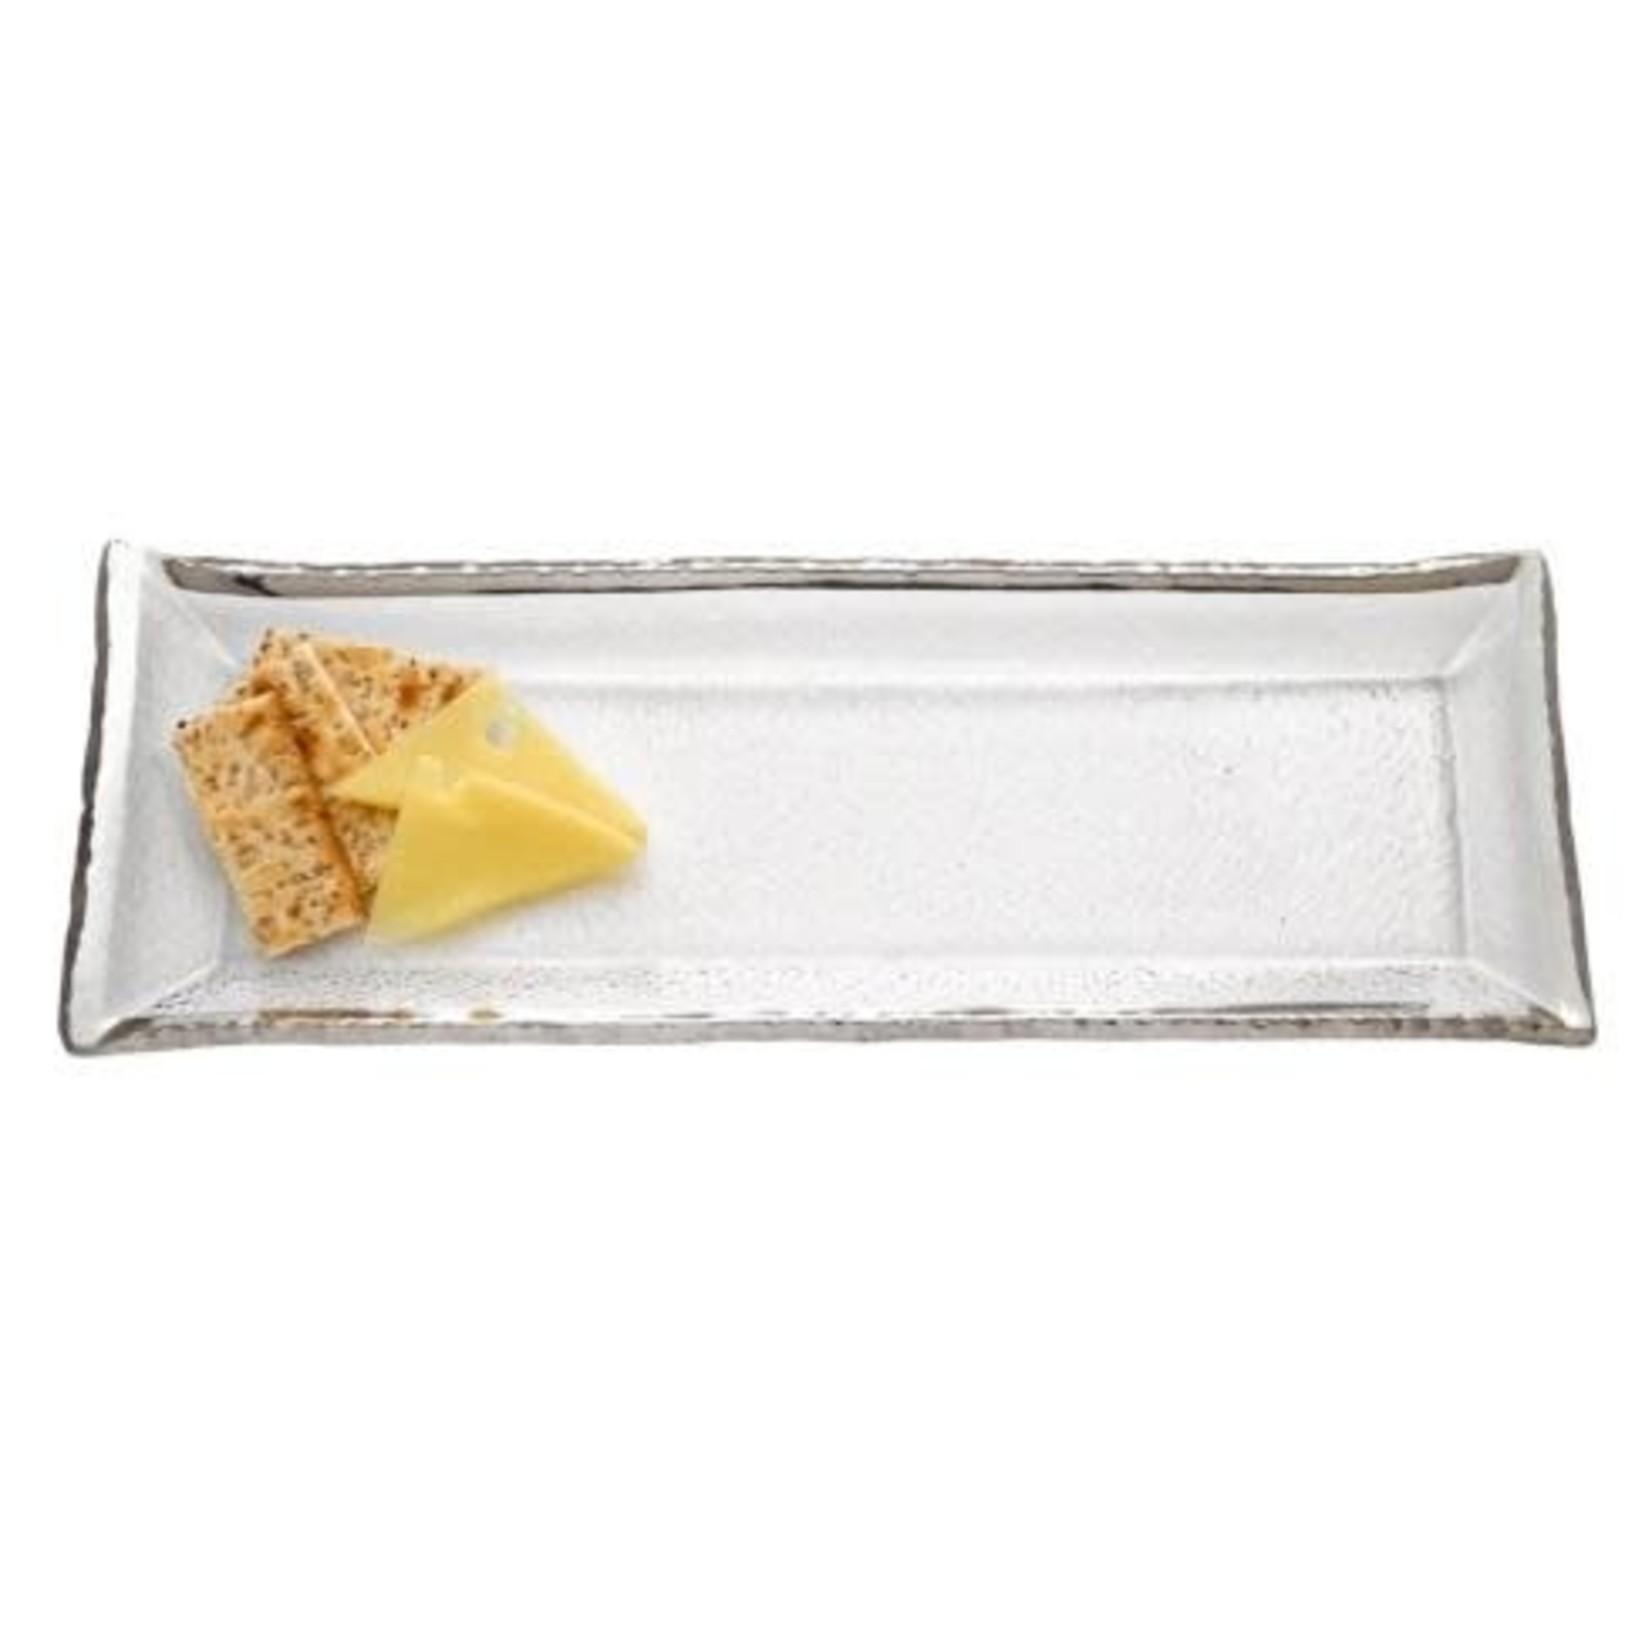 Badash Goldedge & Silveredge Serve Ware Rectangular Glass 18 X 6.5